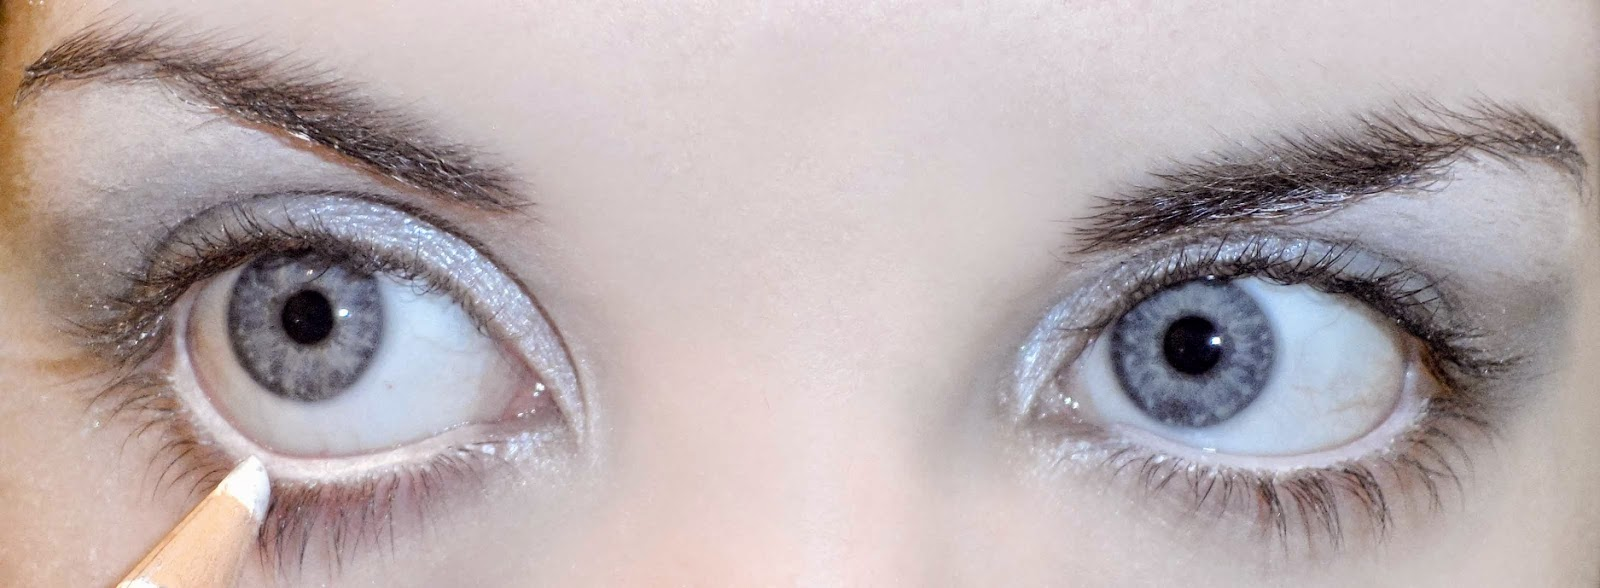 maquillaje para agrandar ojos paso a paso 4